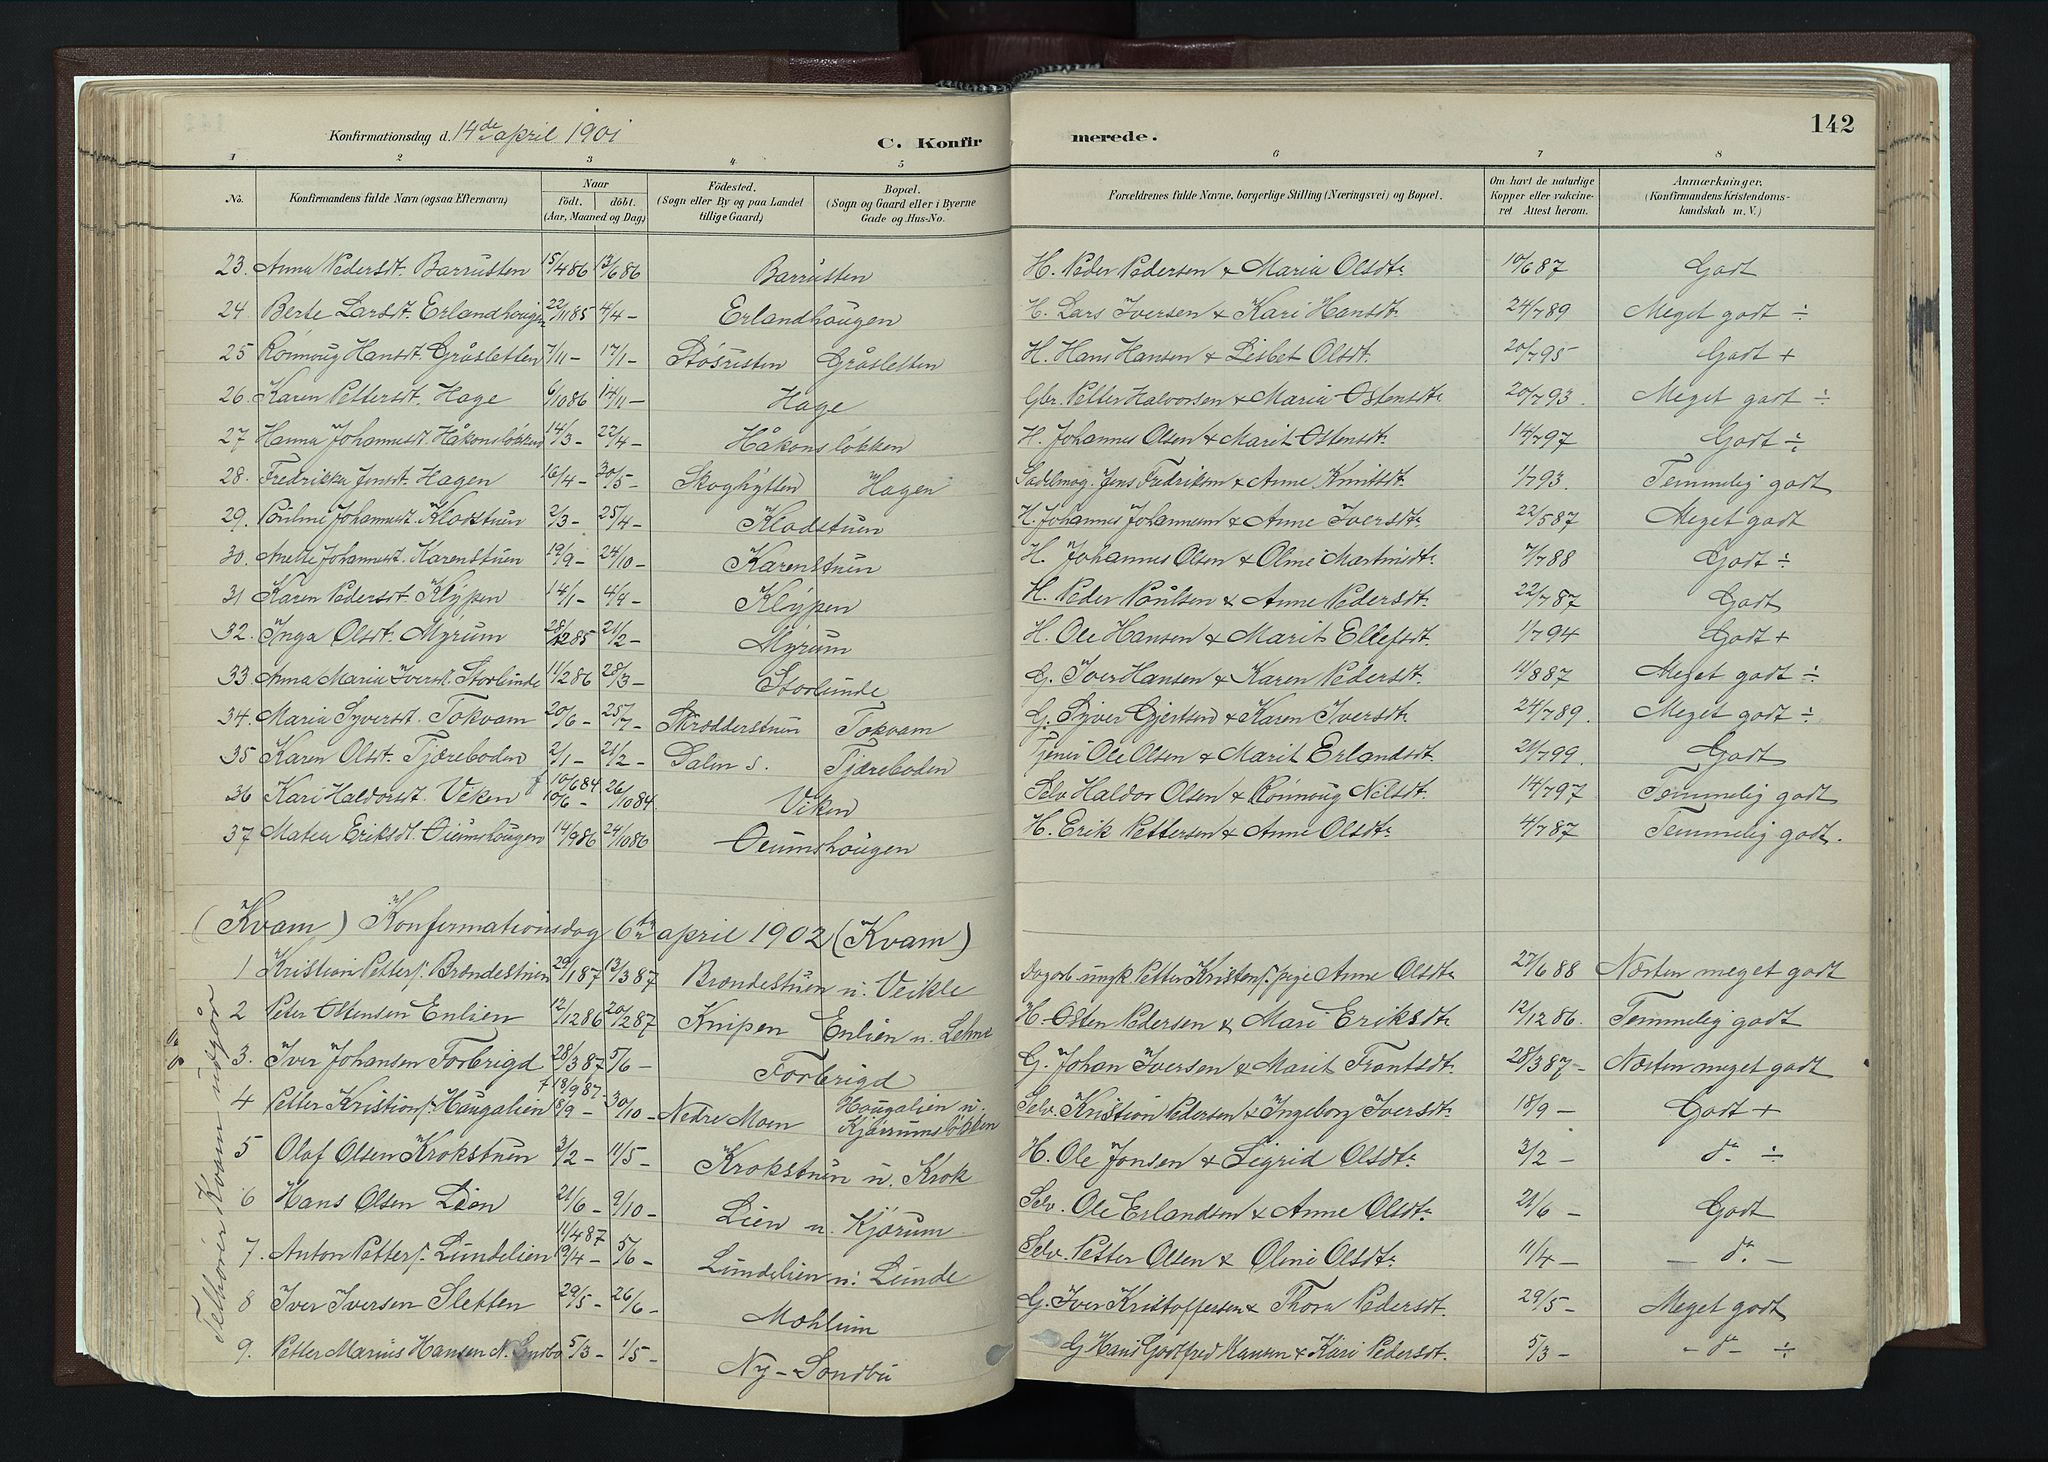 SAH, Nord-Fron prestekontor, Ministerialbok nr. 4, 1884-1914, s. 142